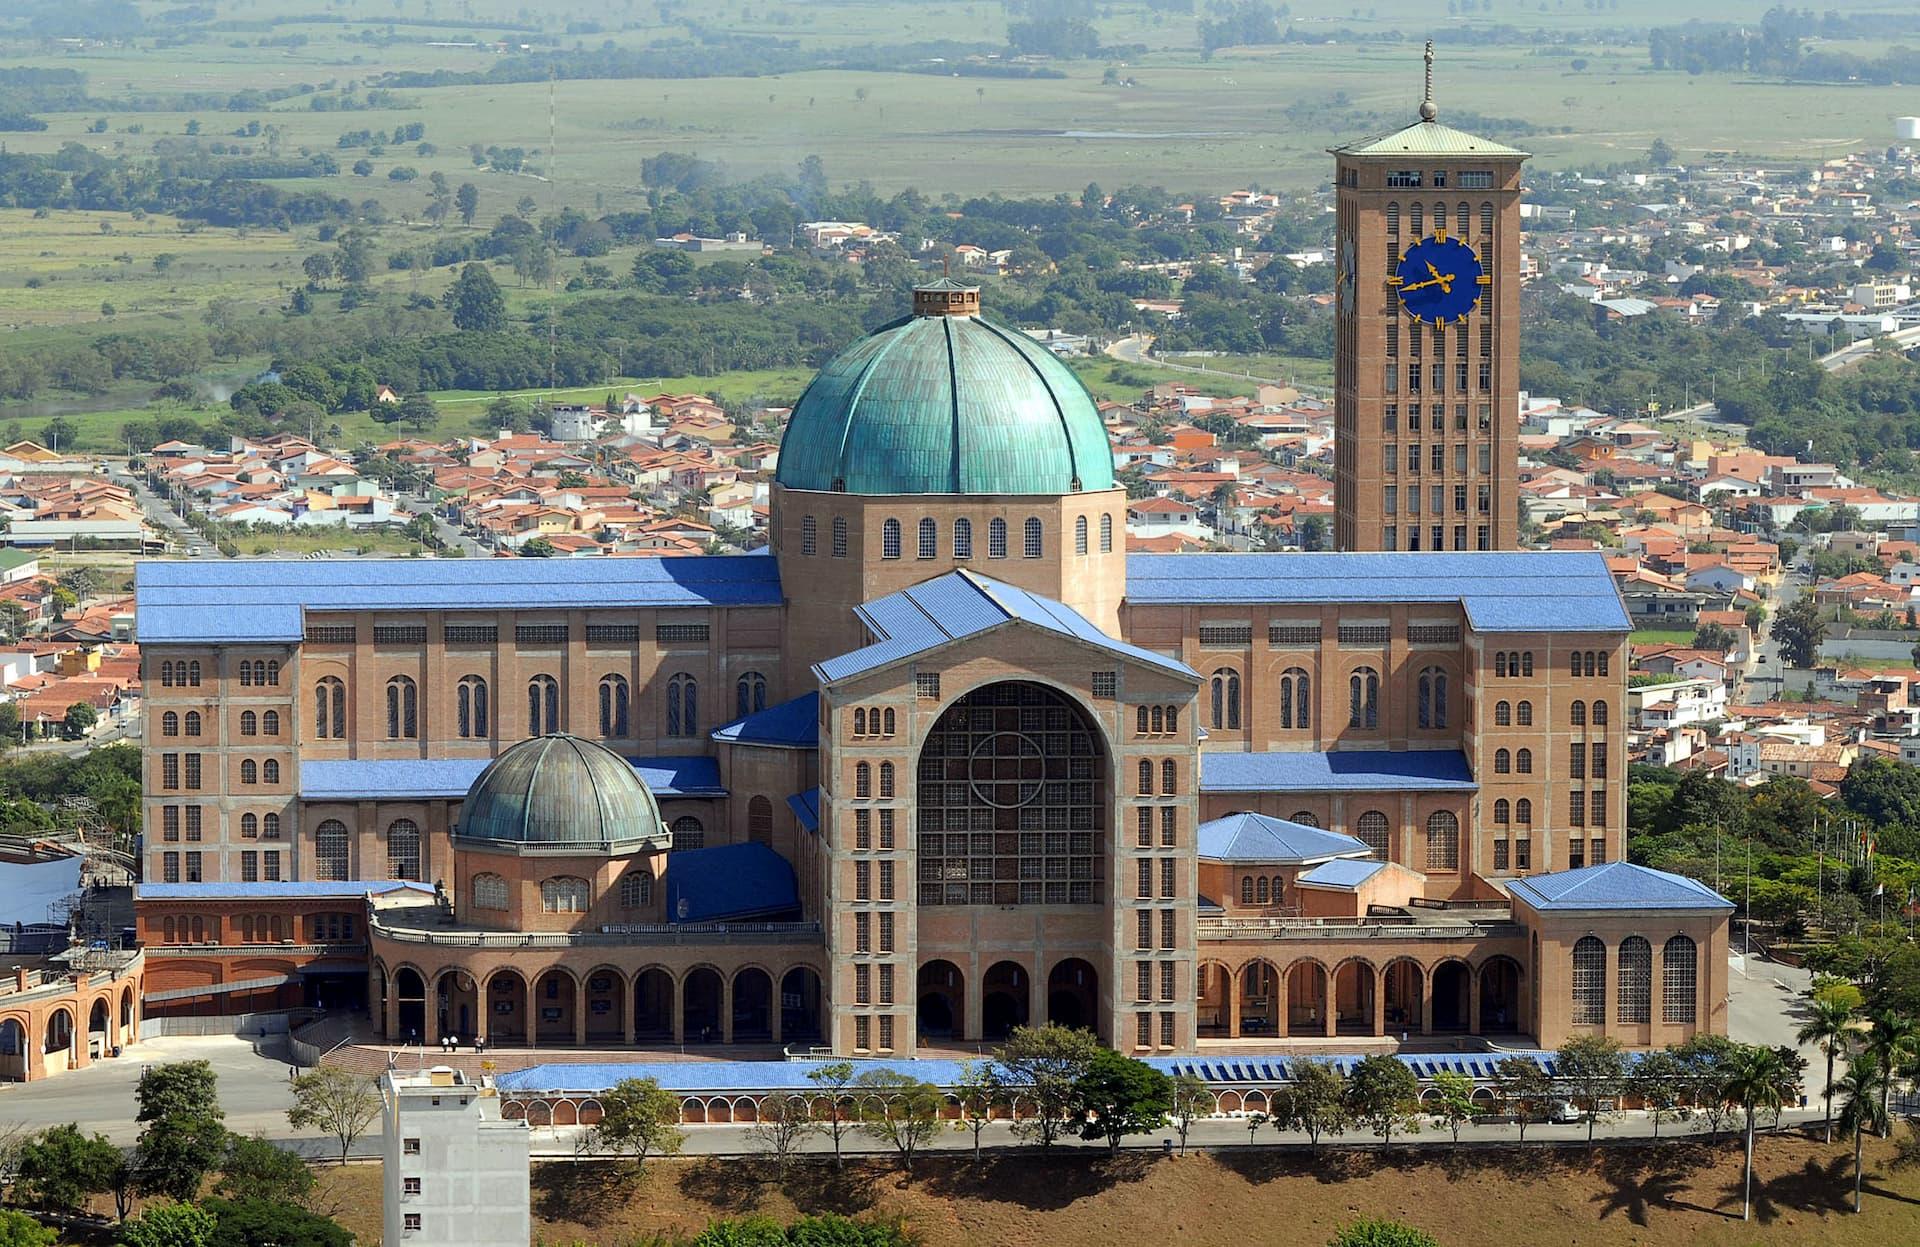 Catedrala din Aparecida